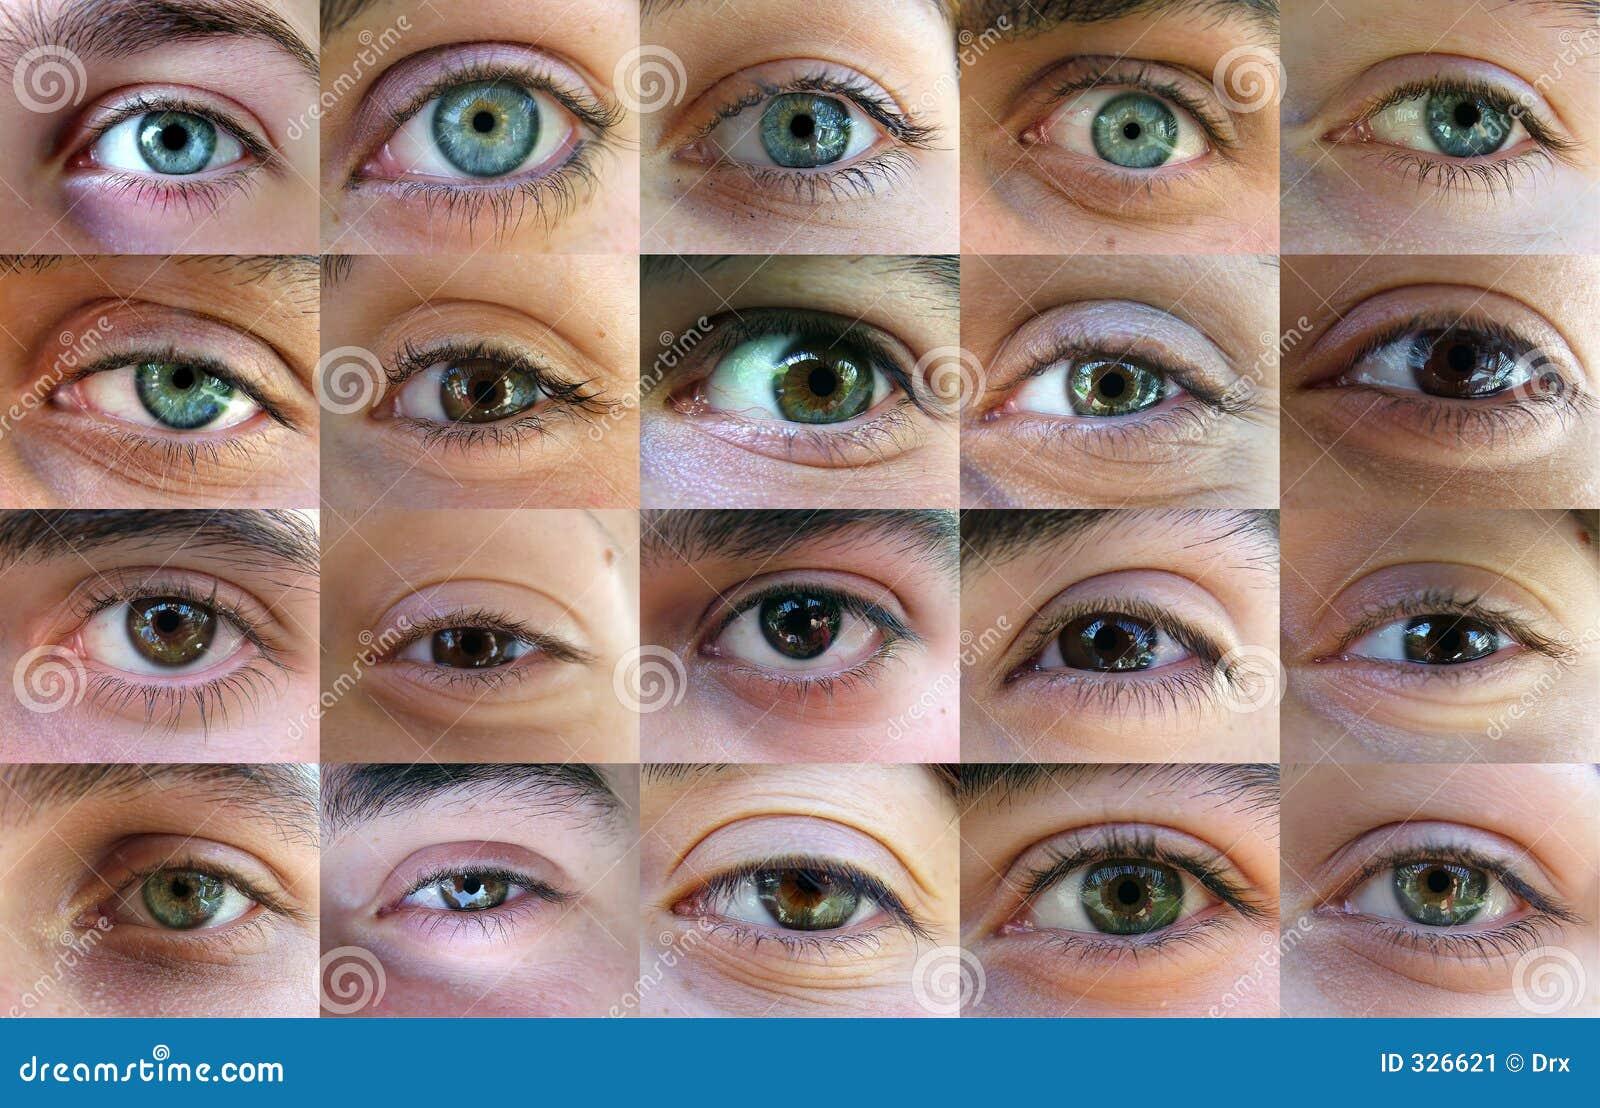 Eye, occhi - molti occhi